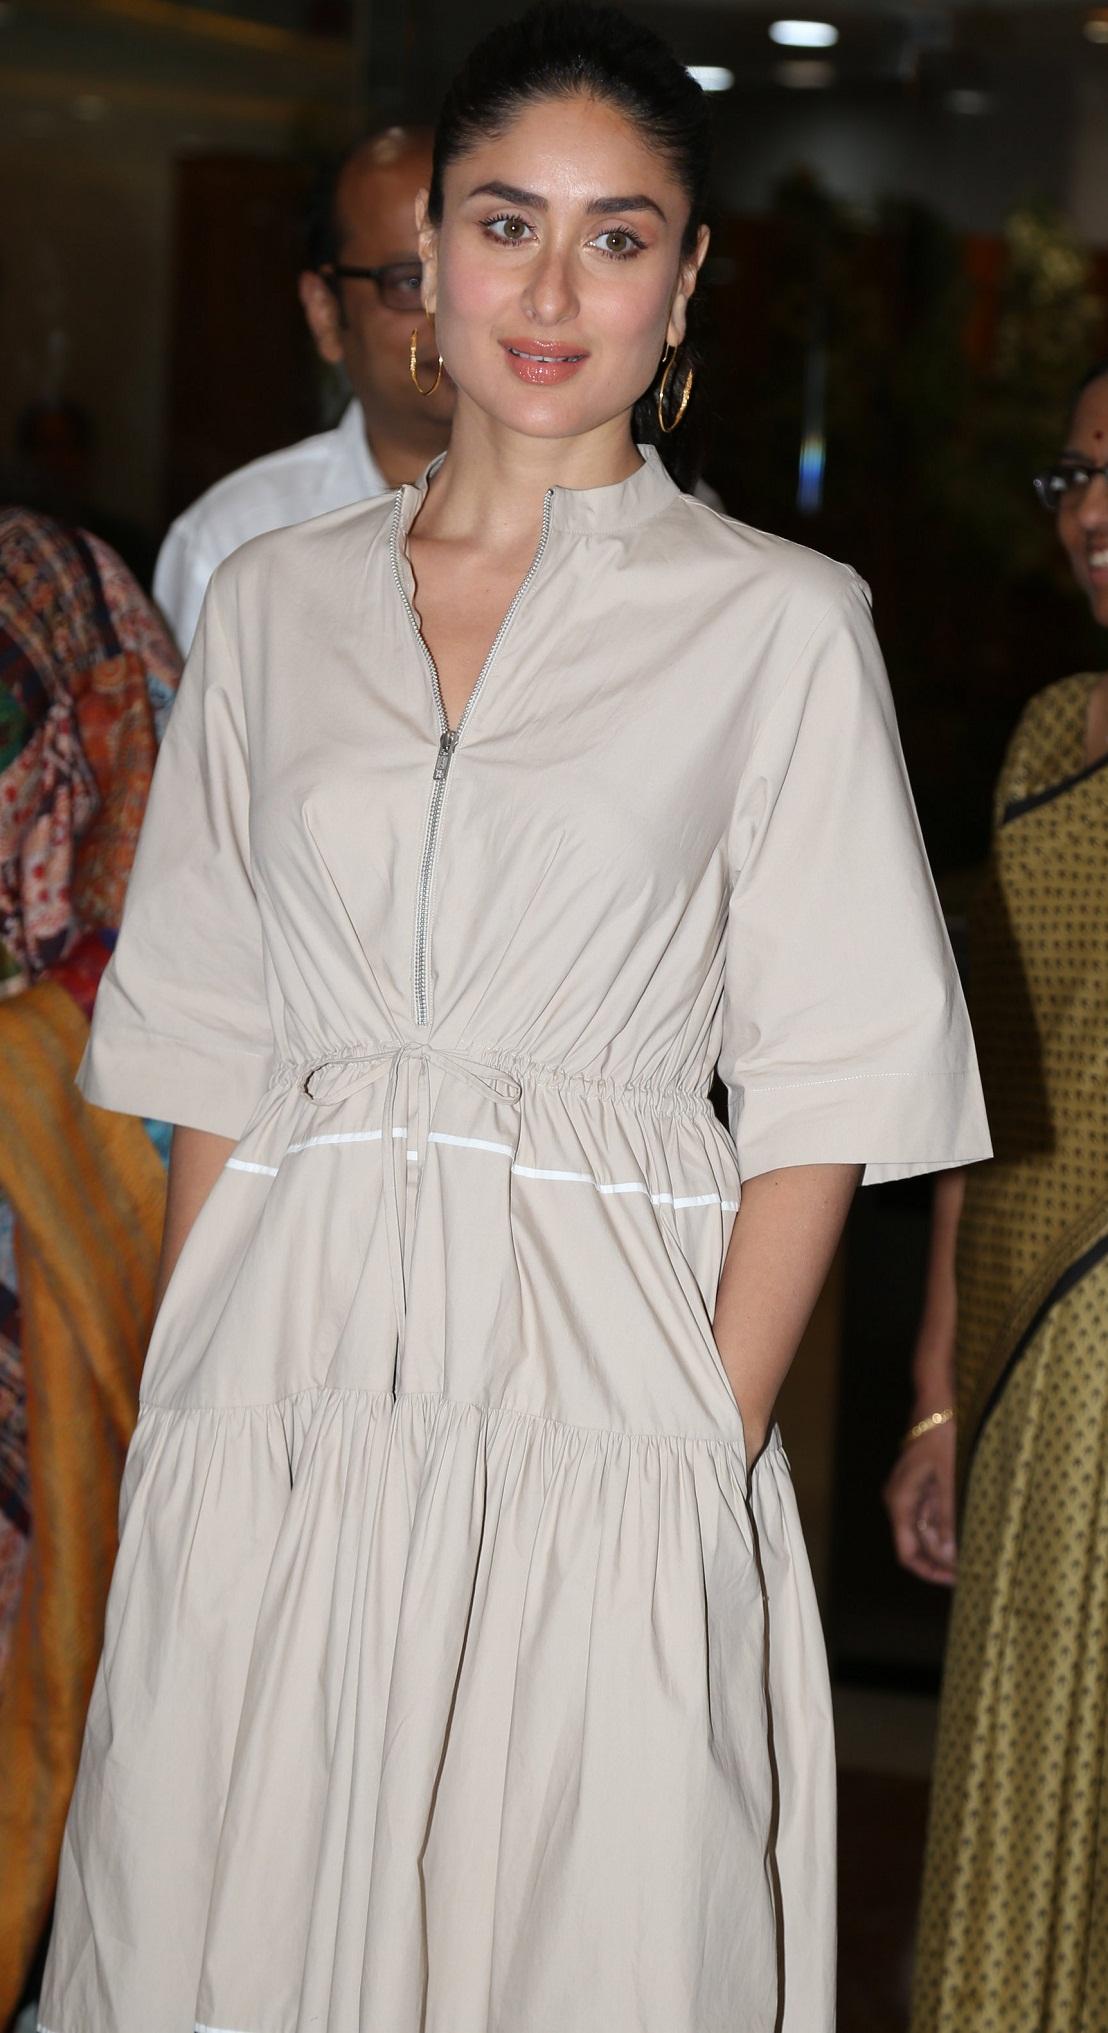 Bollywood Tadka, करीना कपूर खान इमेज, करीना कपूर खान फोटो, करीना कपूर खान पिक्चर